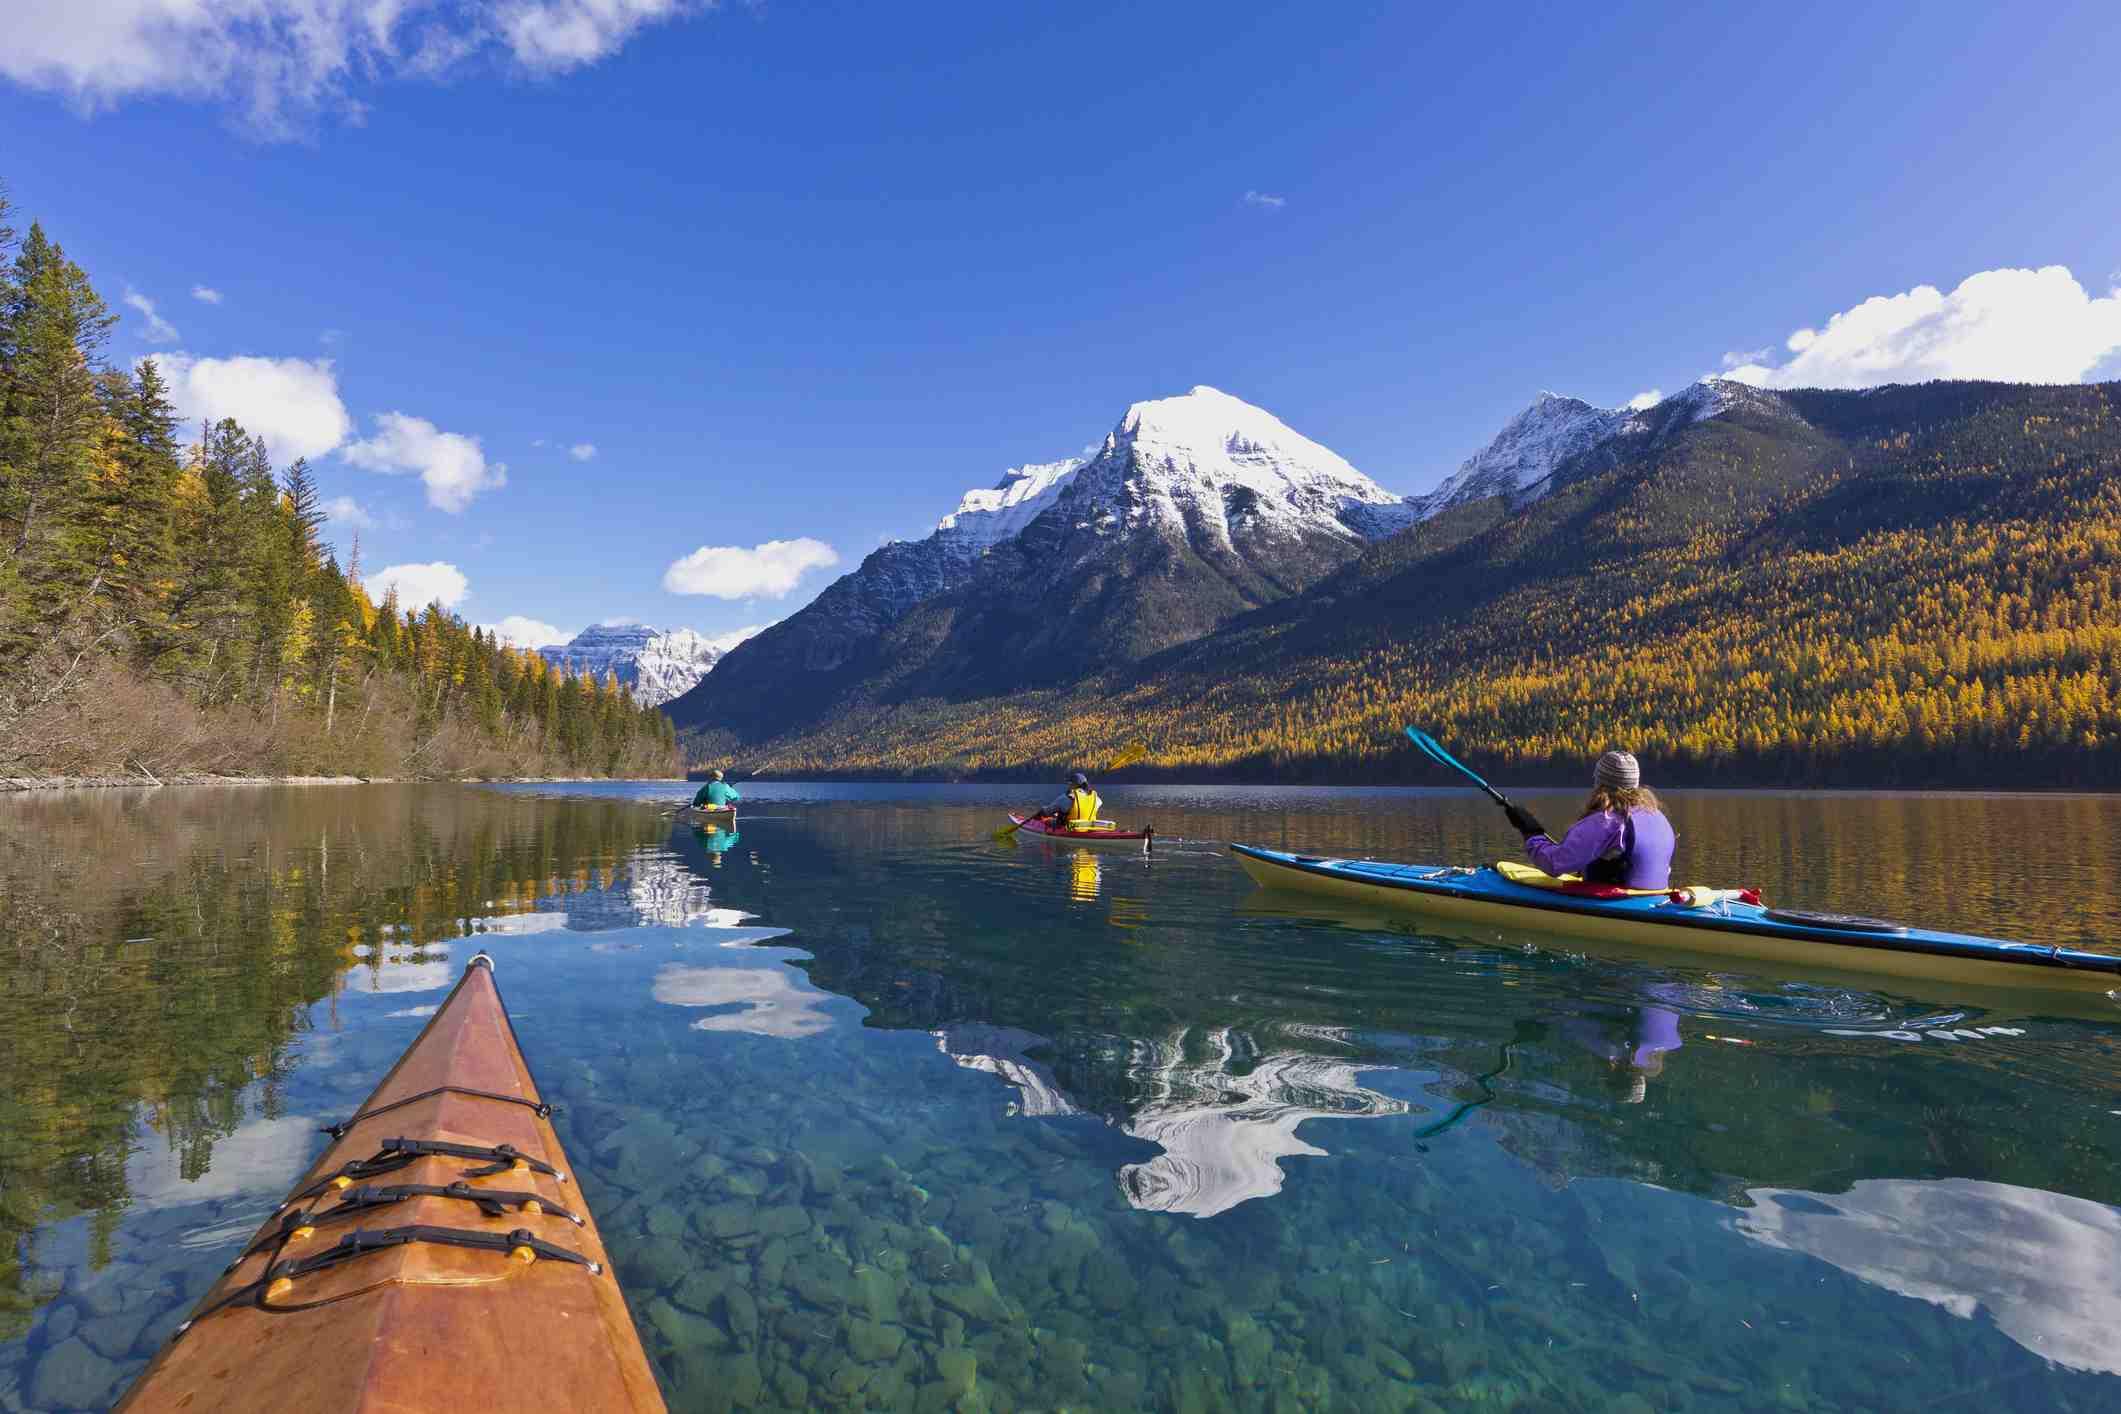 Kayaking on Bowman Lake in autumn, Glacier National Park, Montana, USA